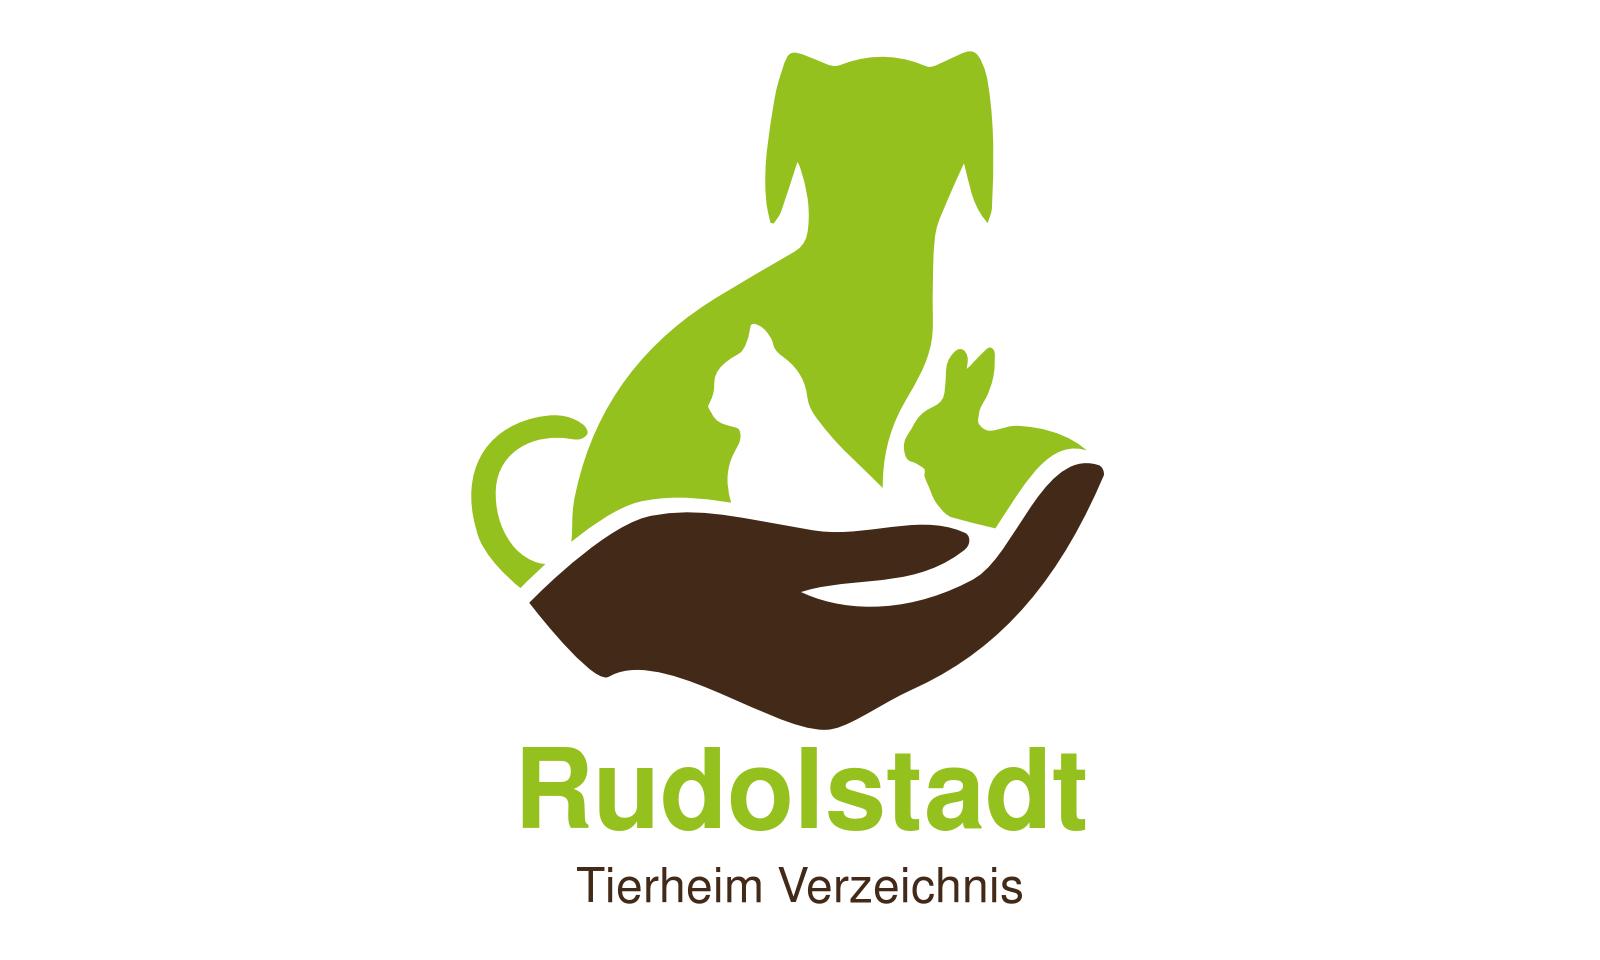 Tierheim Rudolstadt